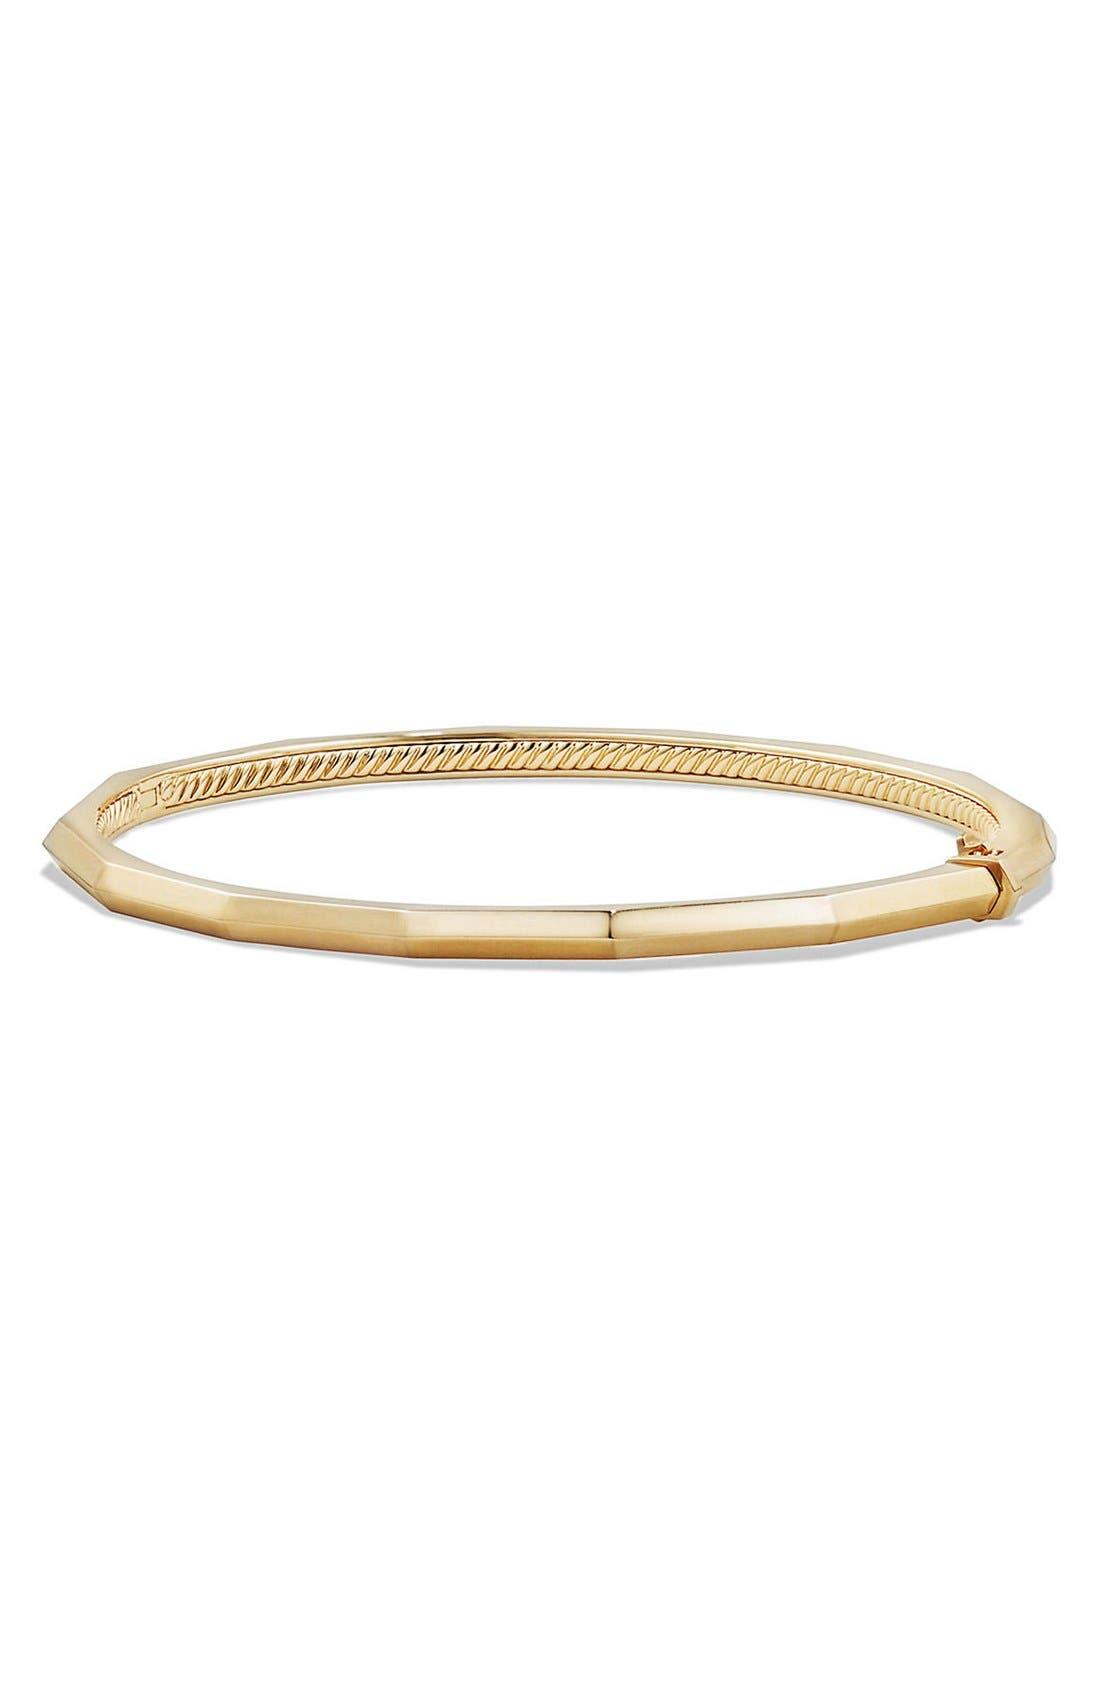 David Yurman Stax Faceted Bracelet